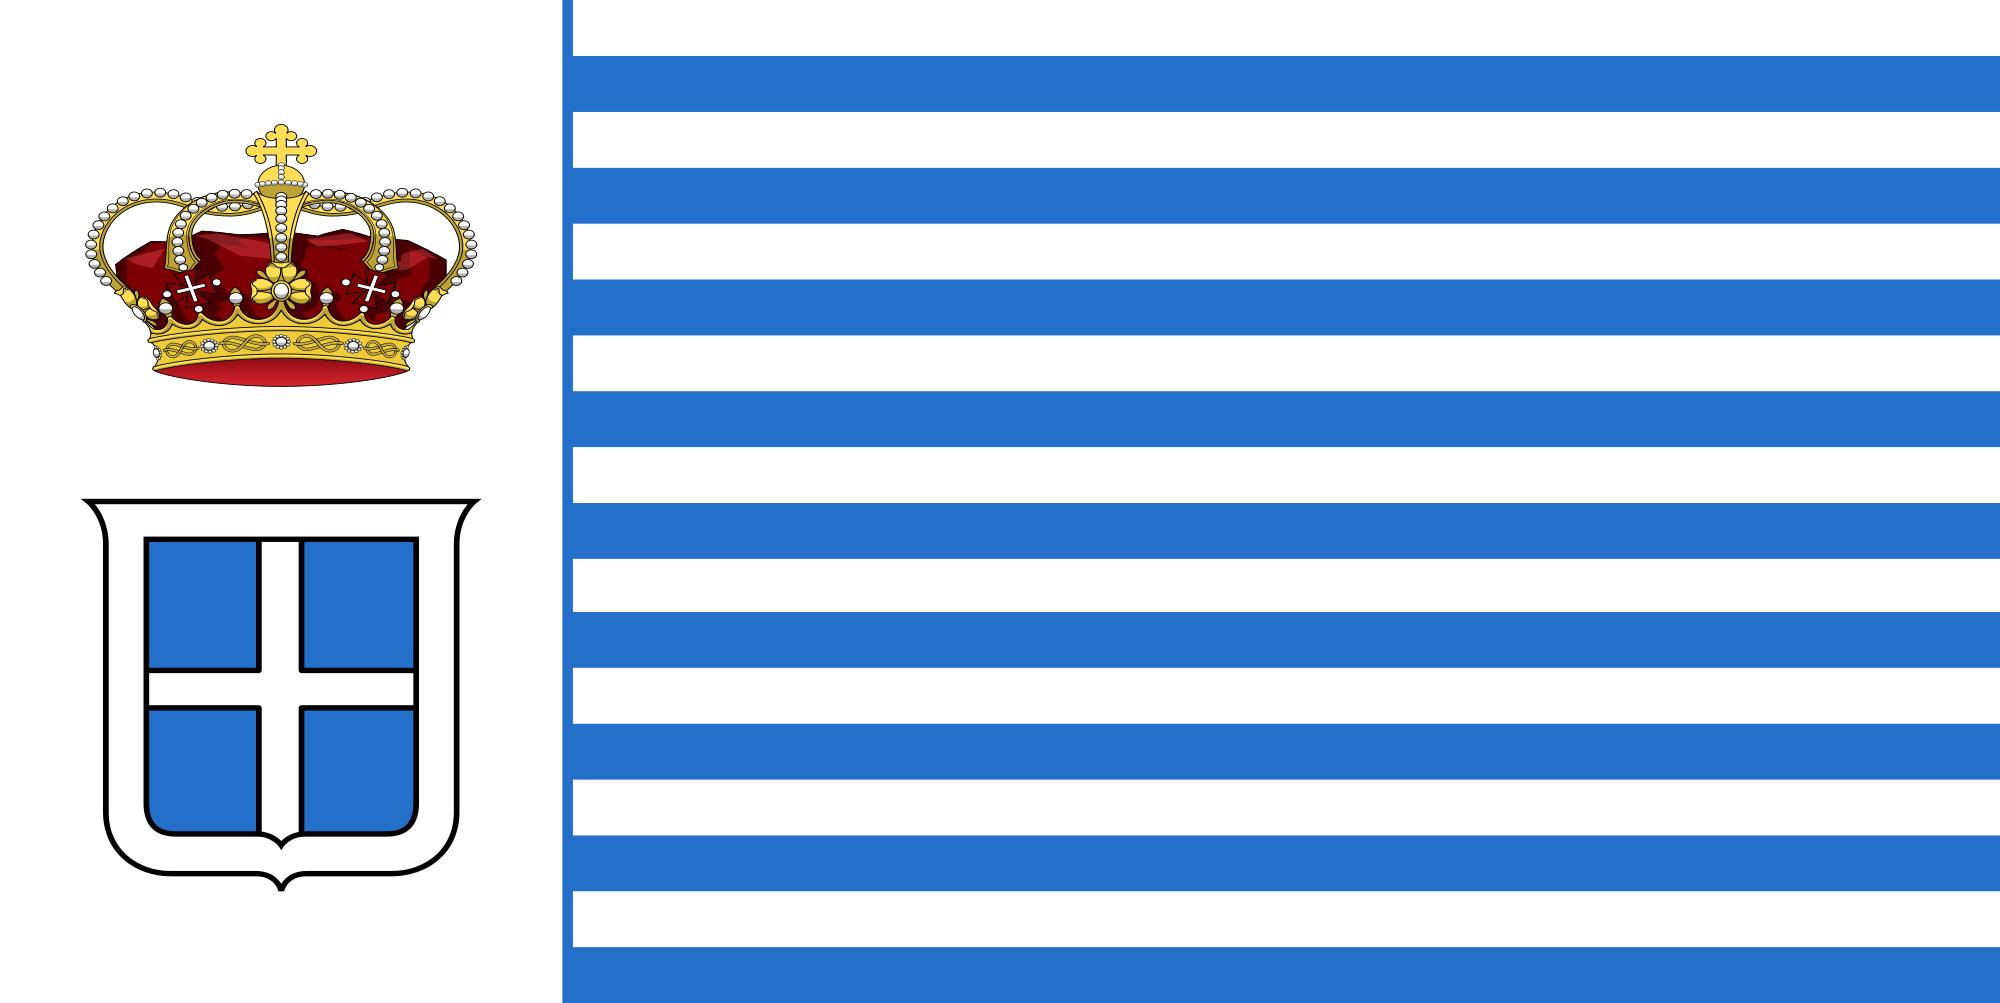 Principality of Seborga